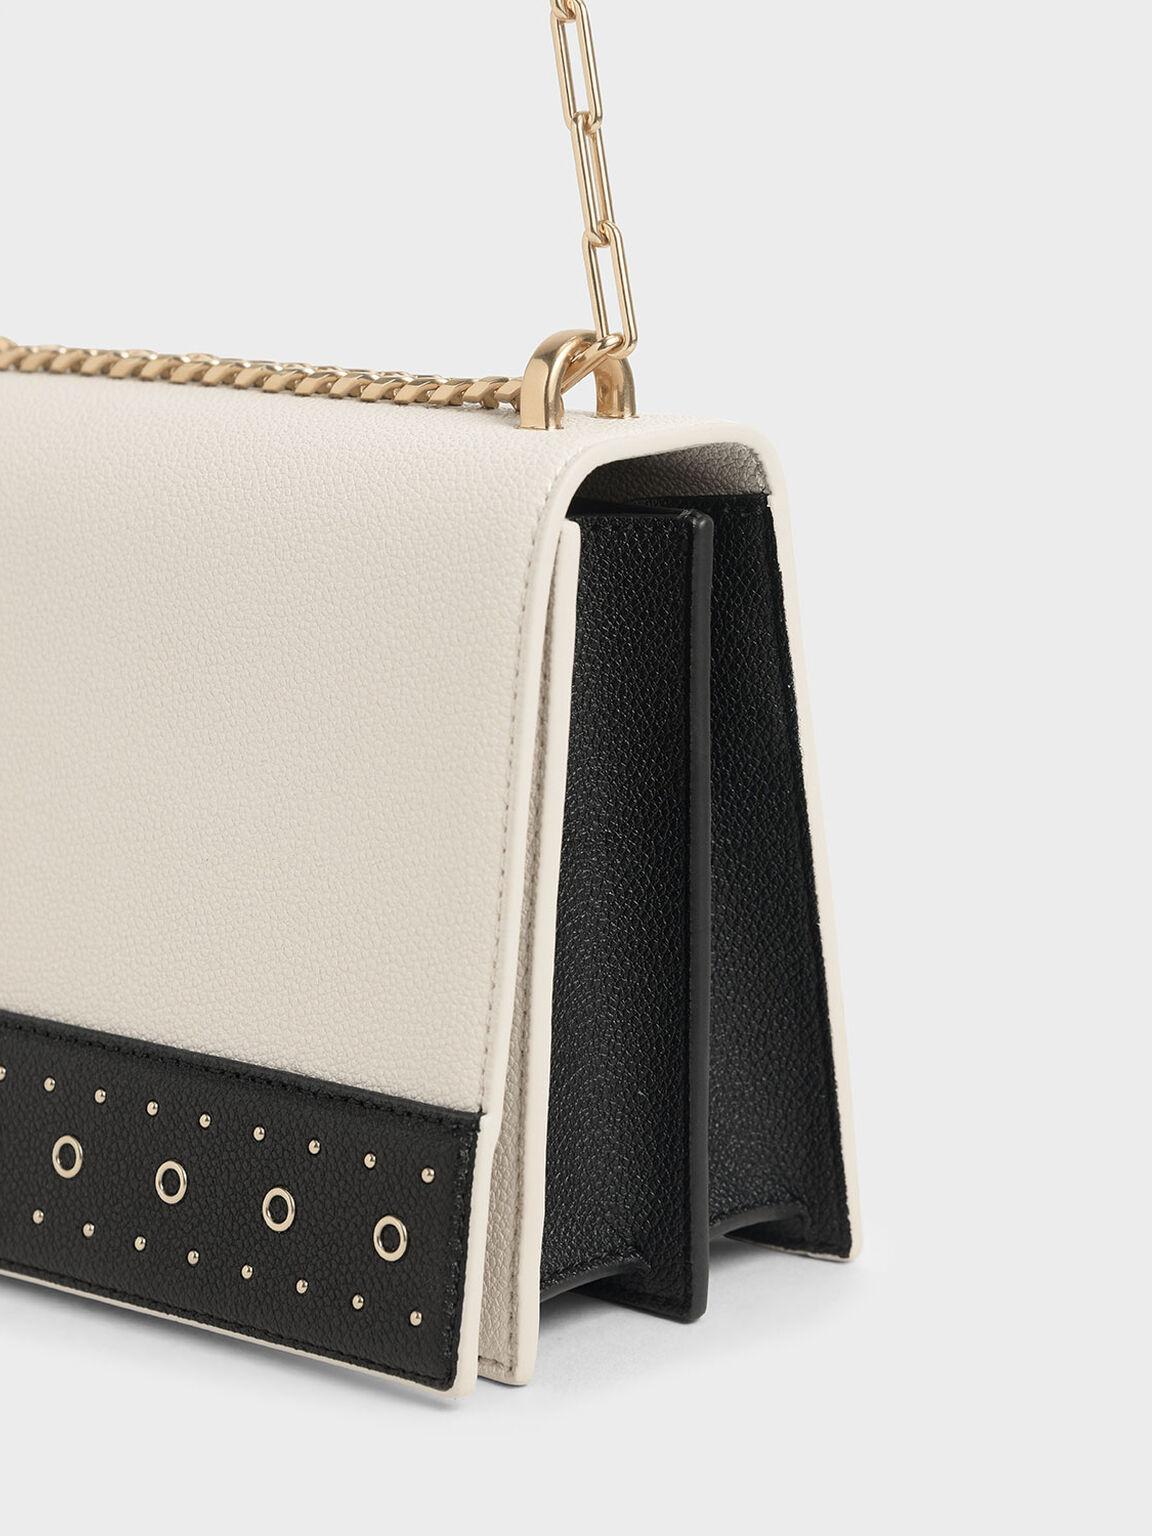 Eyelet-Embellished Crossbody Bag, Cream, hi-res